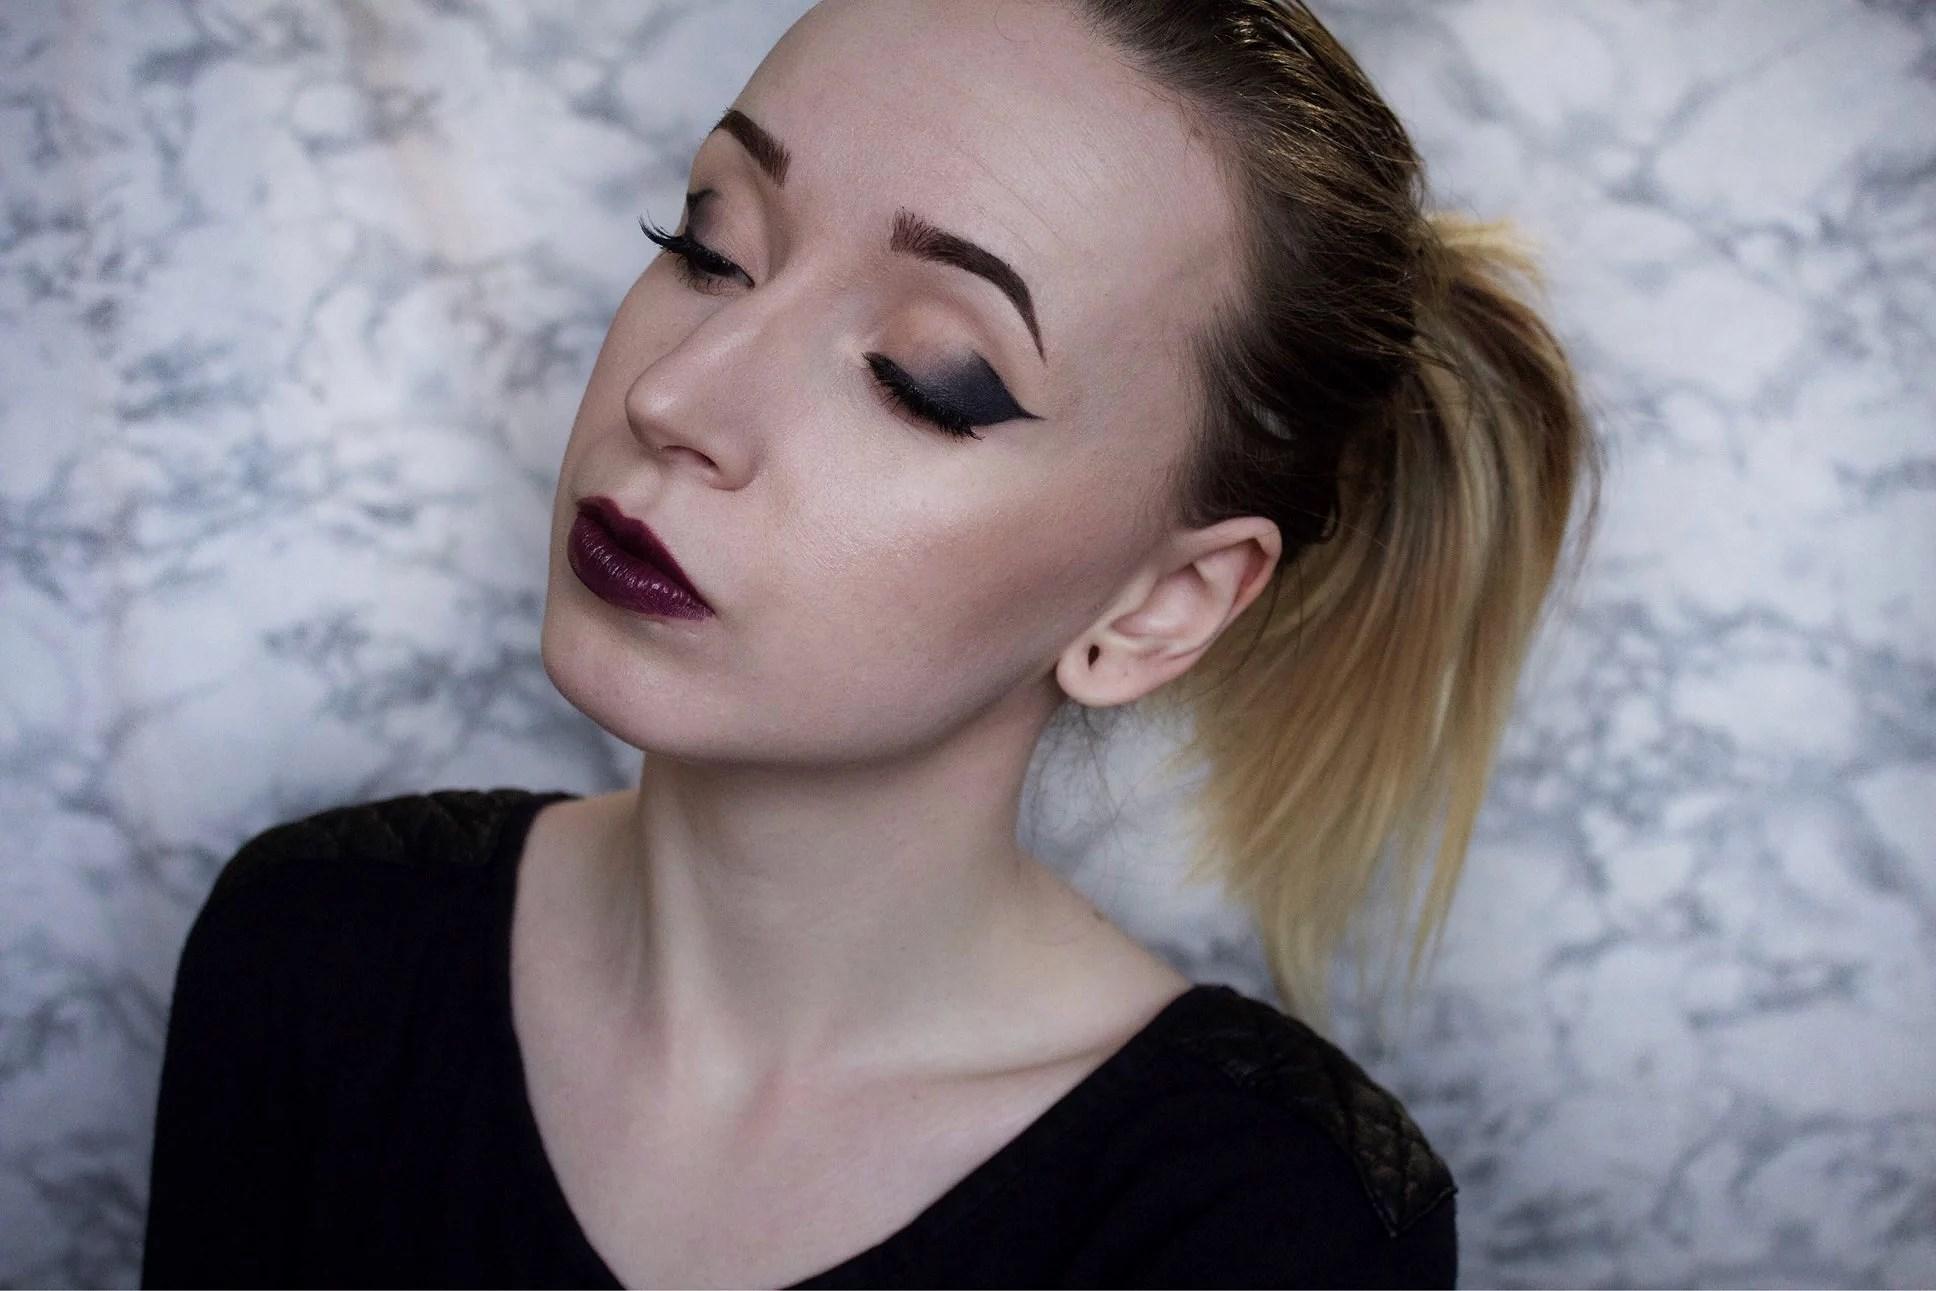 Makeup look: Dramatic cateye